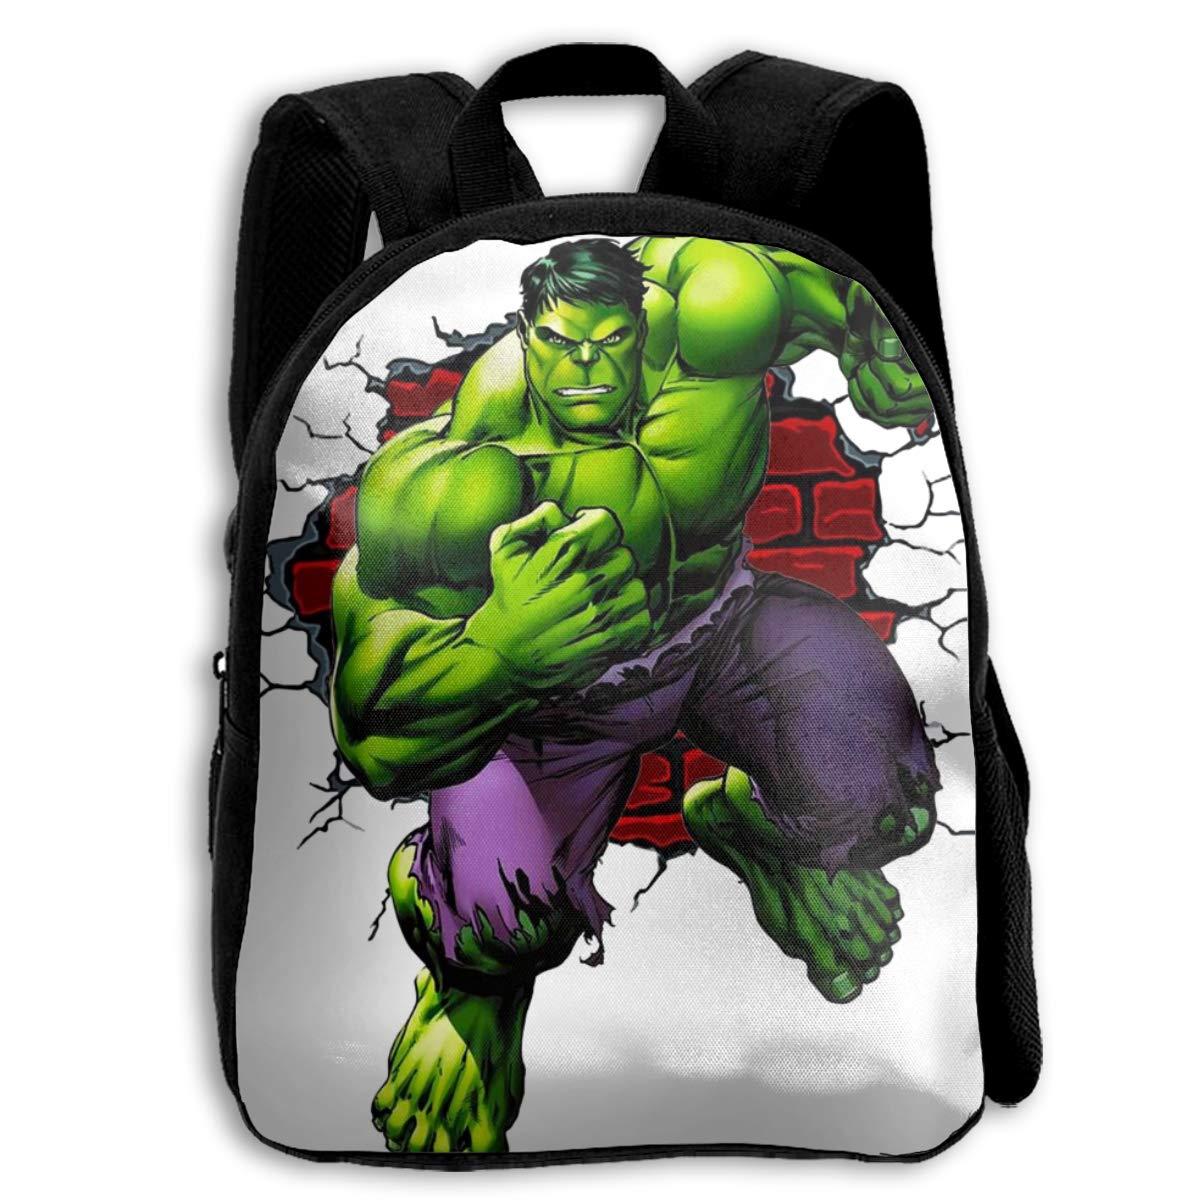 CHLING Mochila para niños con Estampado de Hulk, Bolsa ...